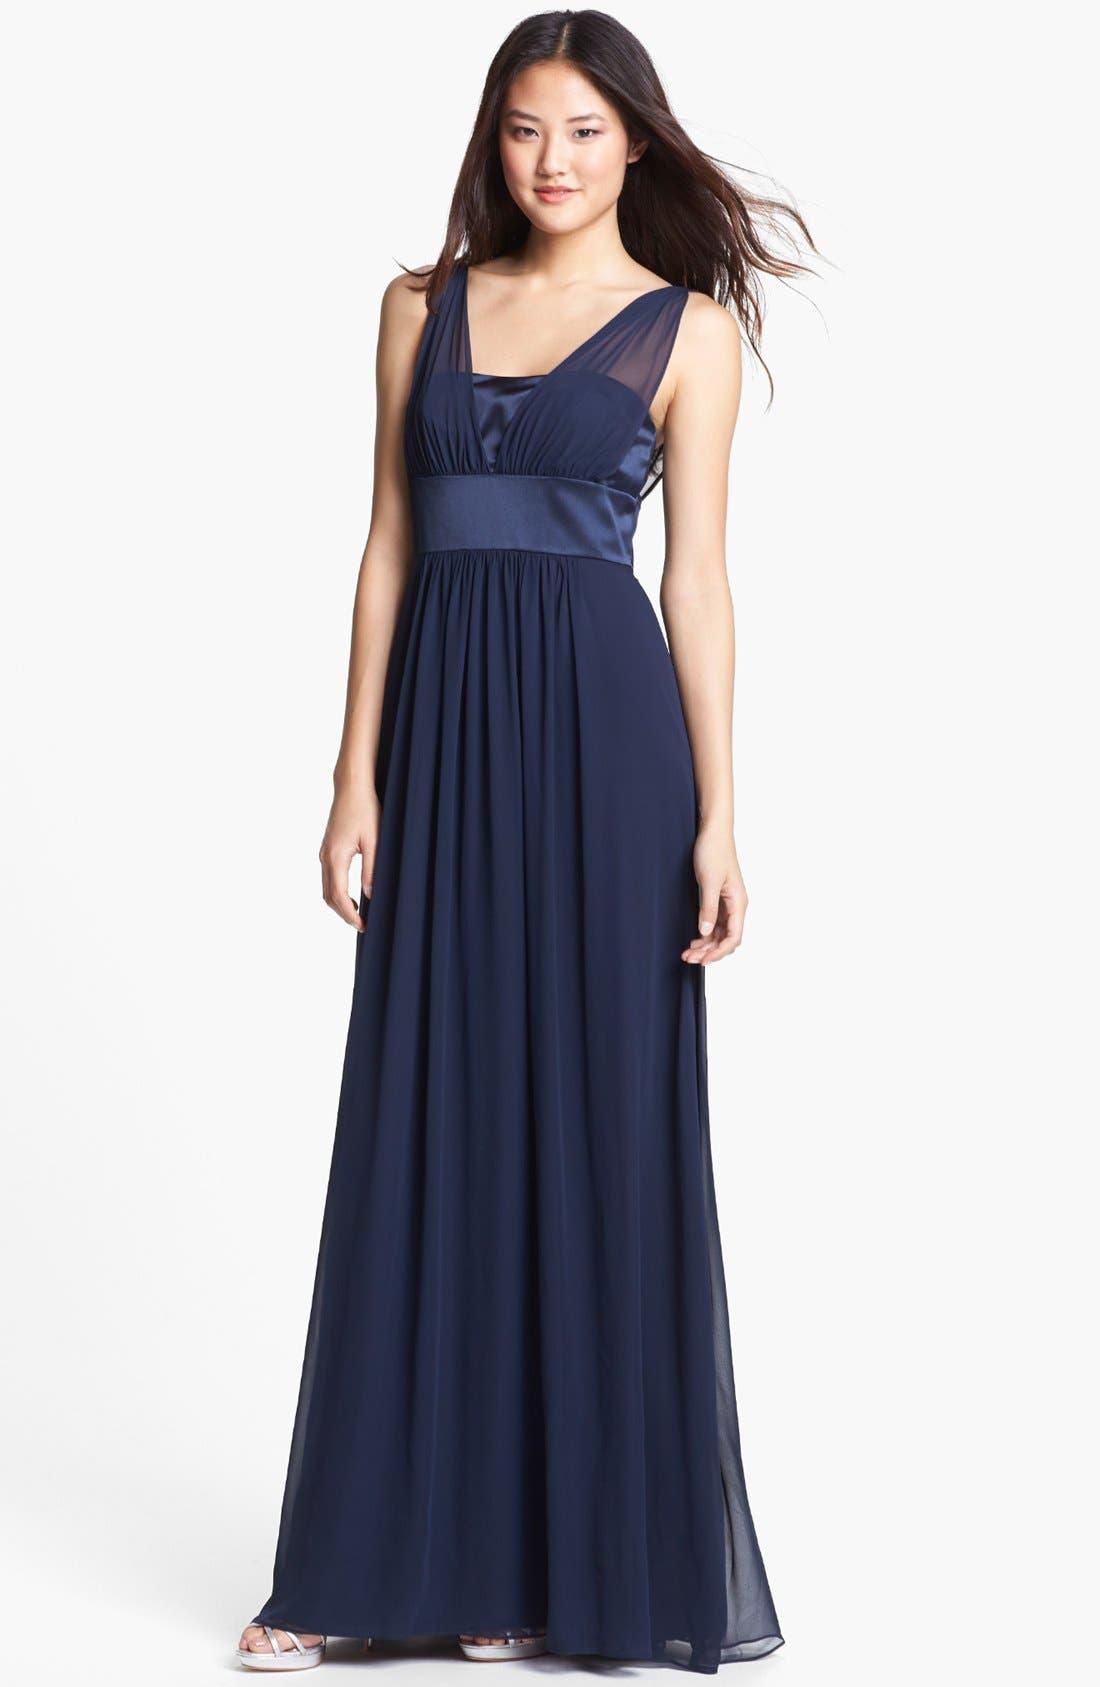 Main Image - Dessy Collection Satin & Chiffon Dress